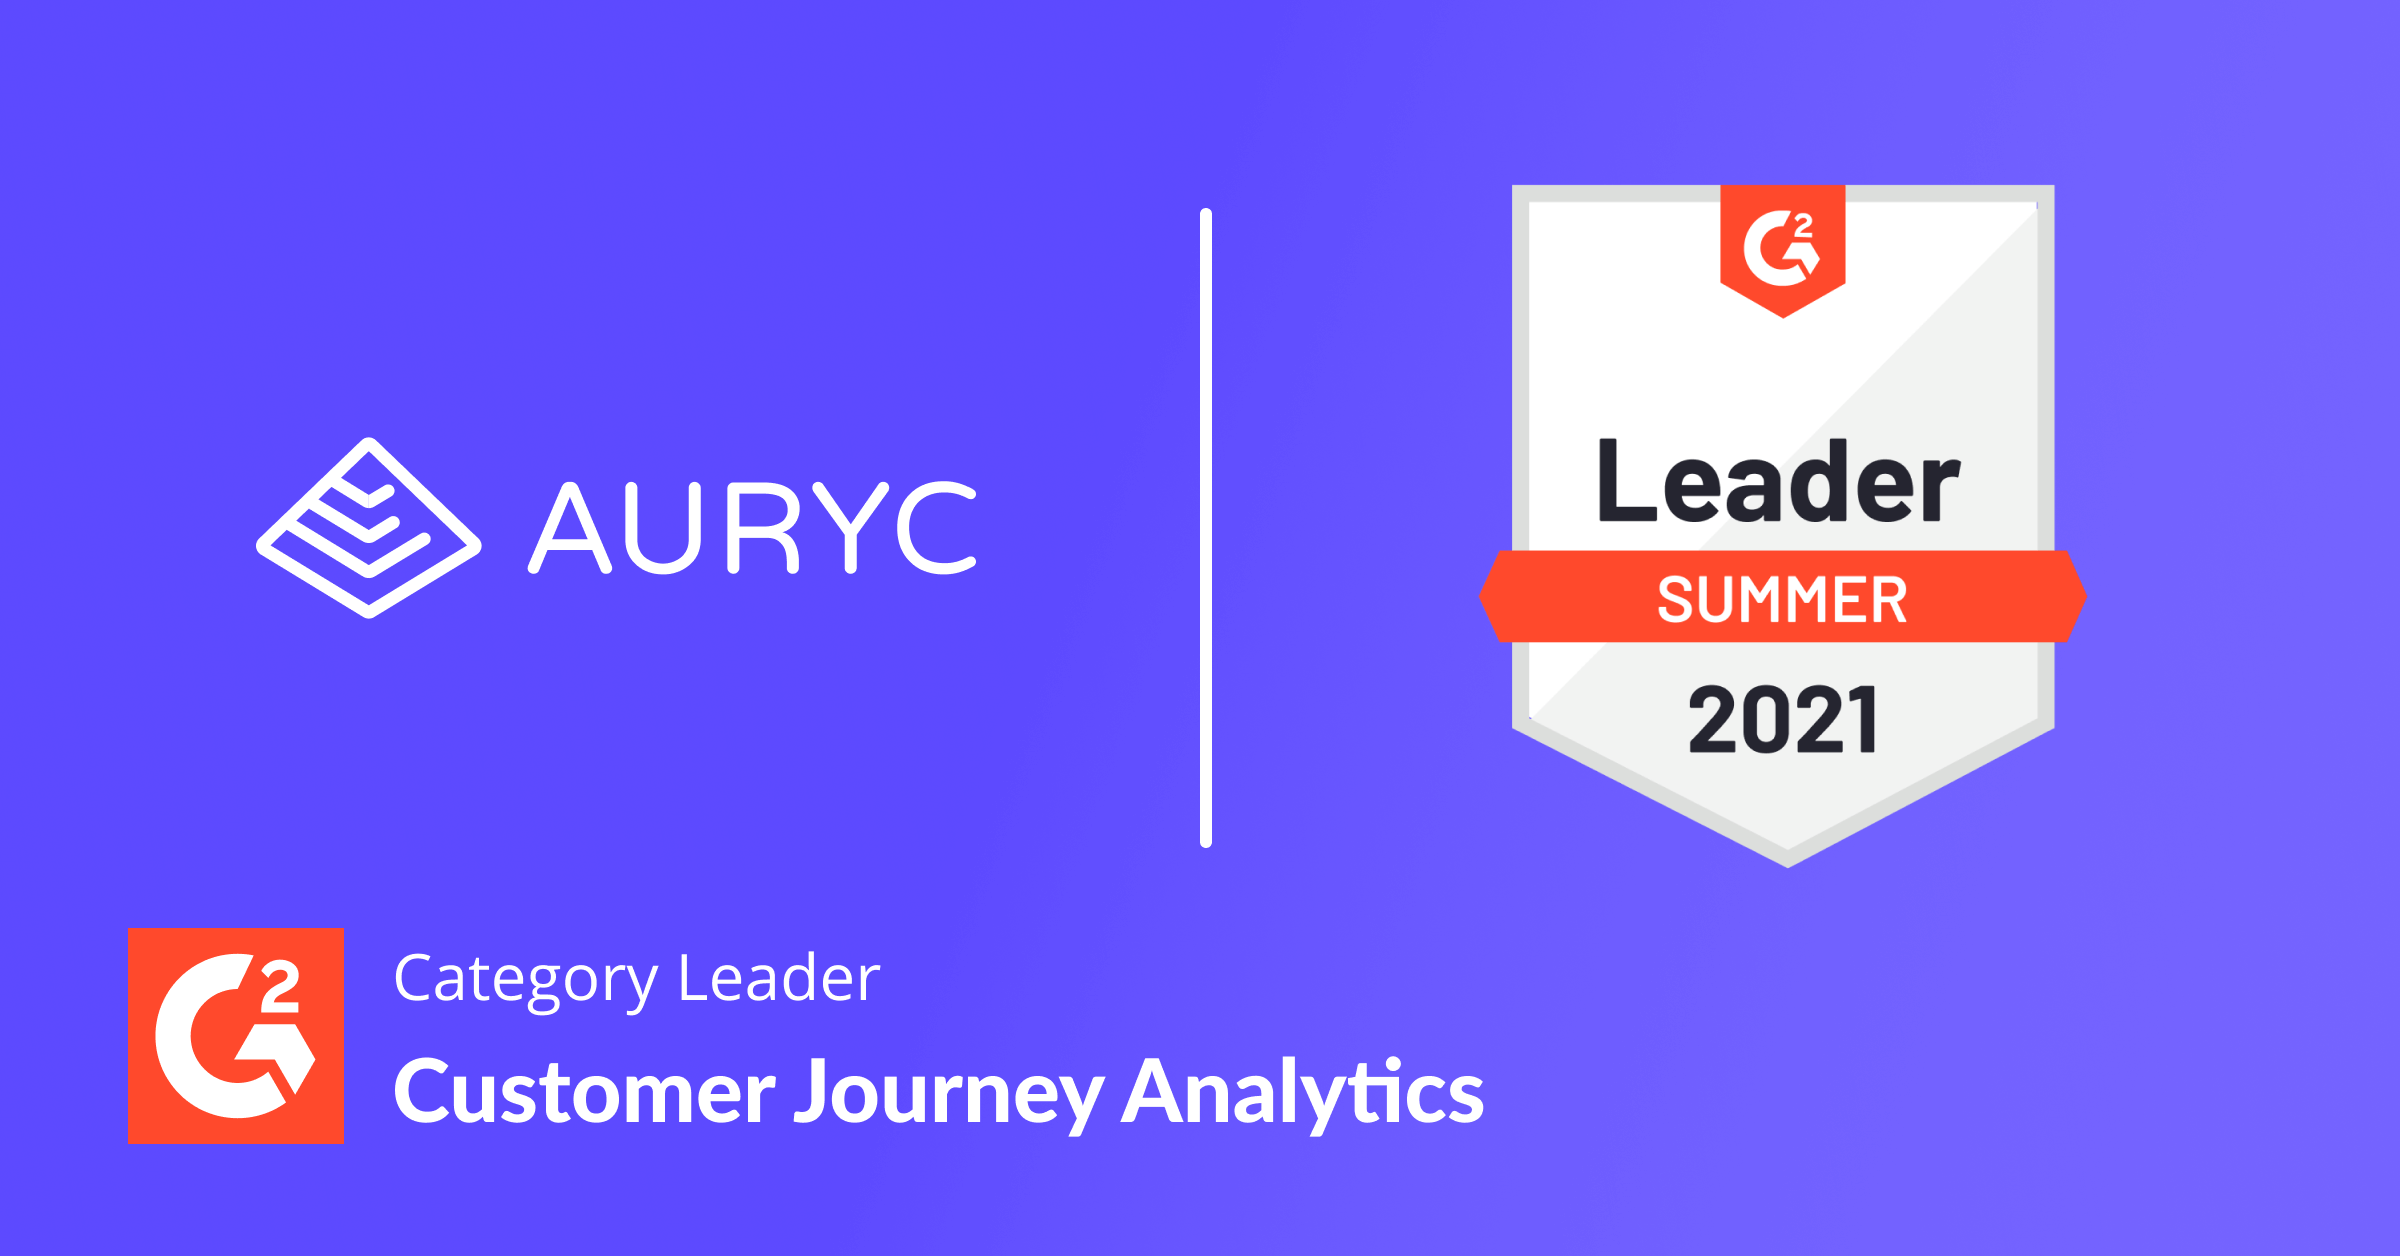 BLOG-FI-Auryc-named-leader-in-customer-journey-analytics-g2-best-customer-journey-analytics-platform